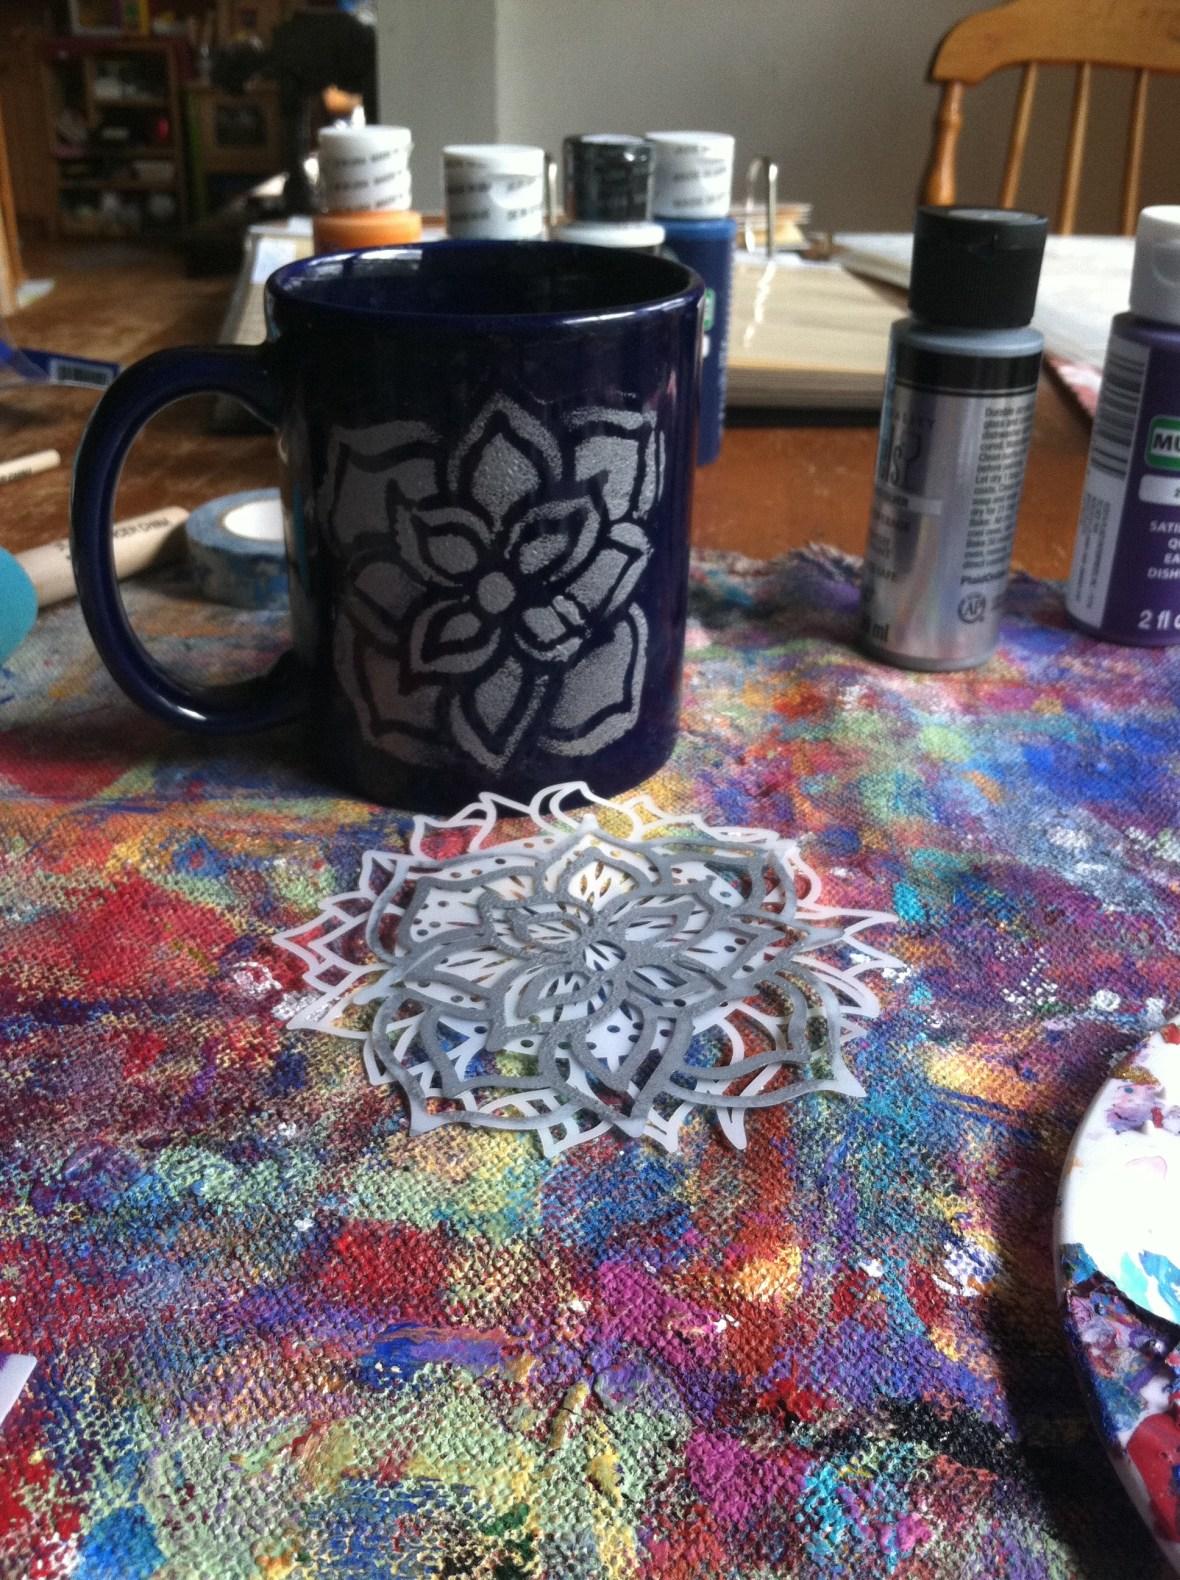 Removing stencil from mug